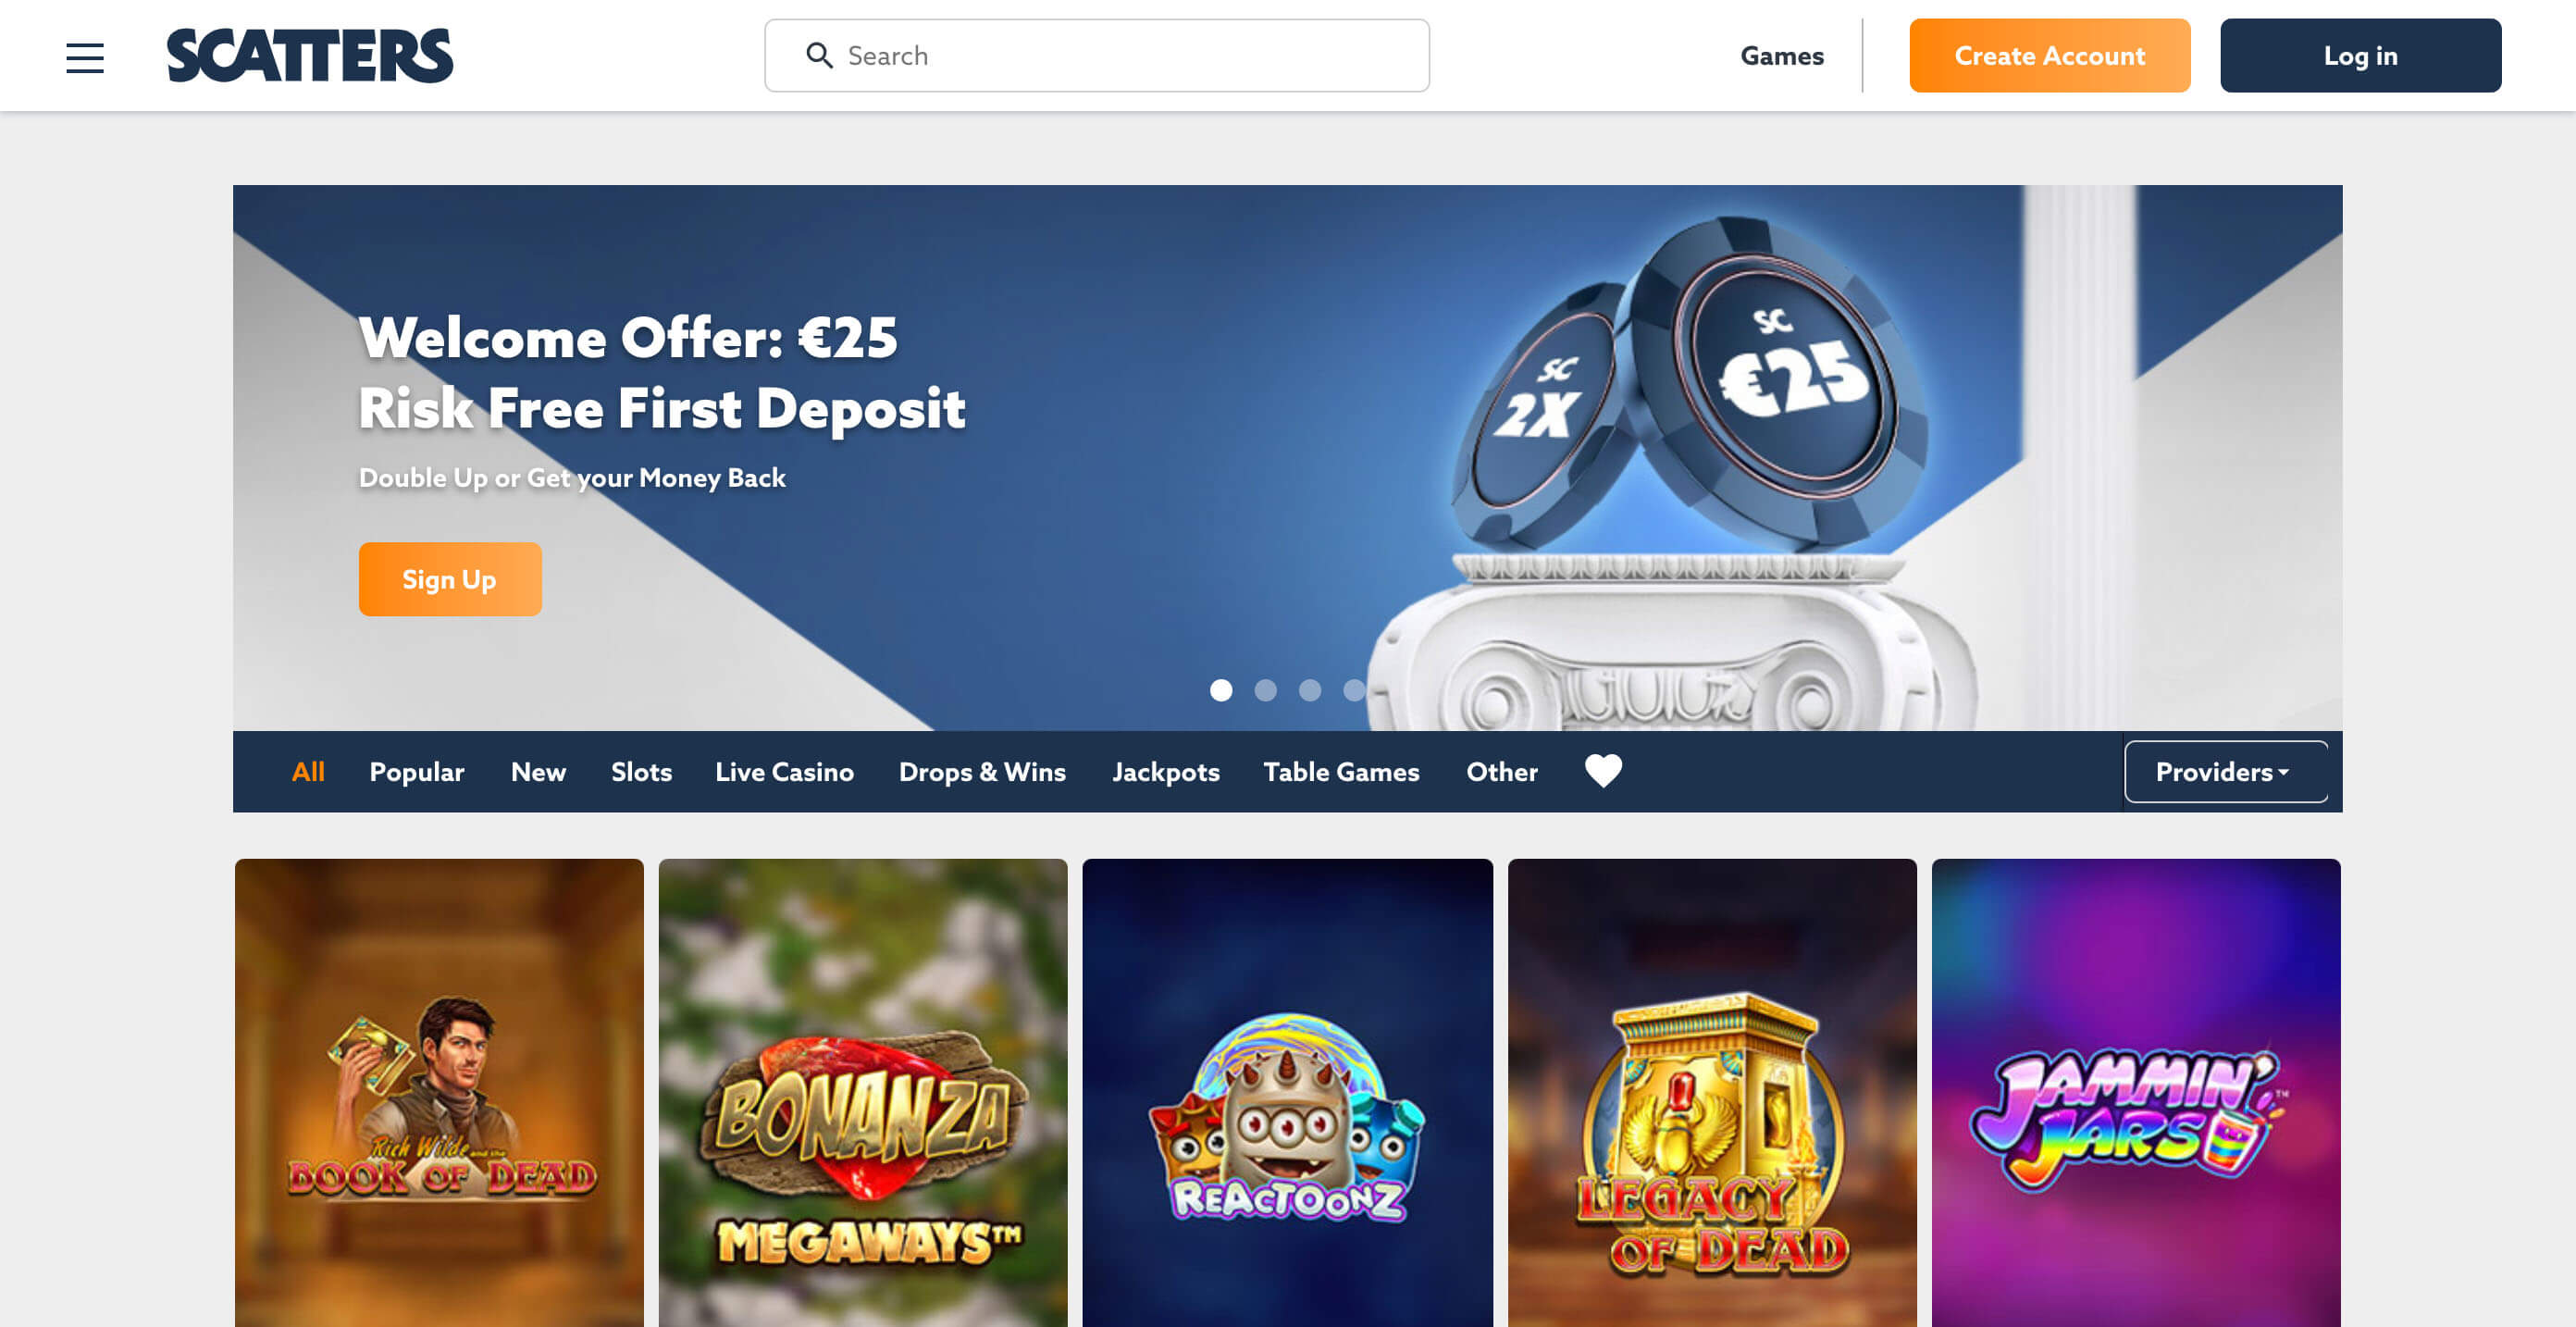 Seriose Online Casinos Test